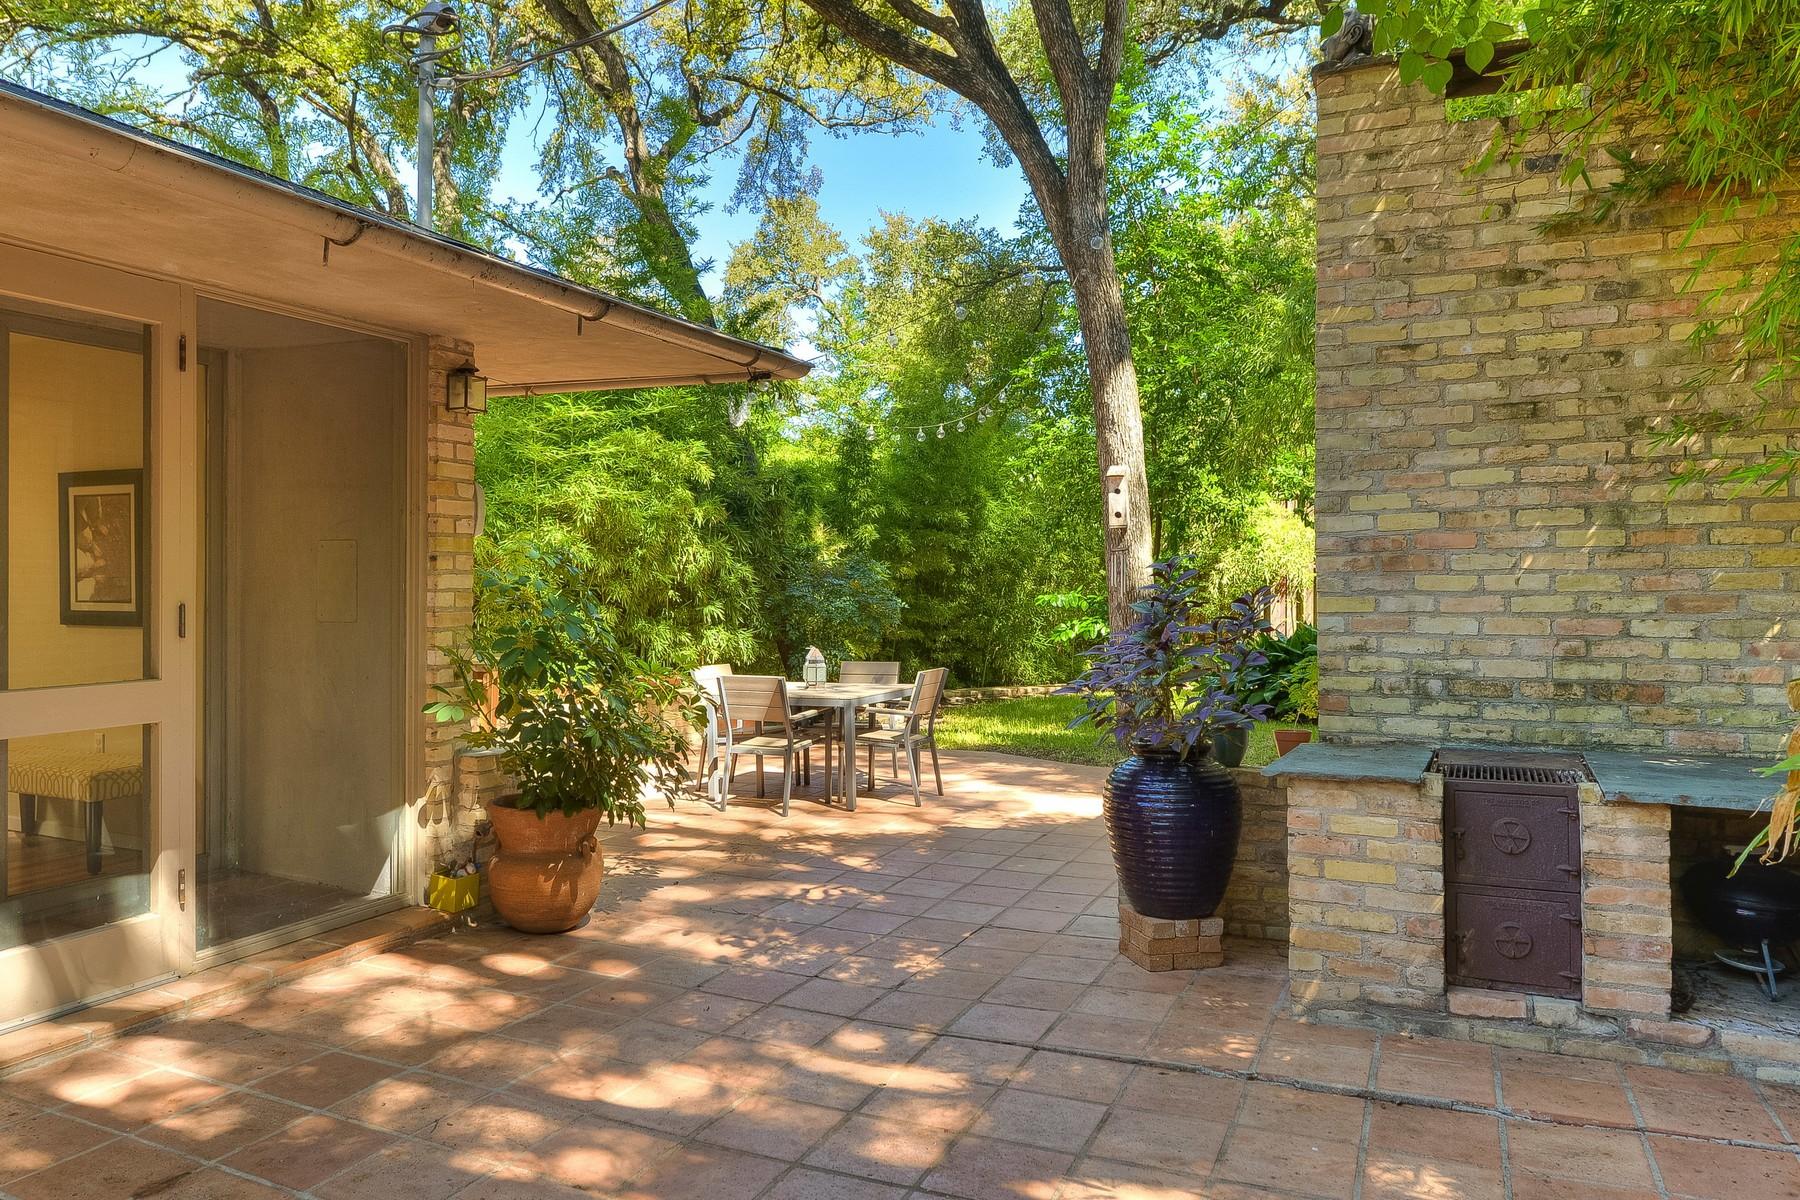 Additional photo for property listing at Stunning Mid-Century Modern Architecture 2311 Shoal Creek Blvd Austin, Texas 78705 Estados Unidos